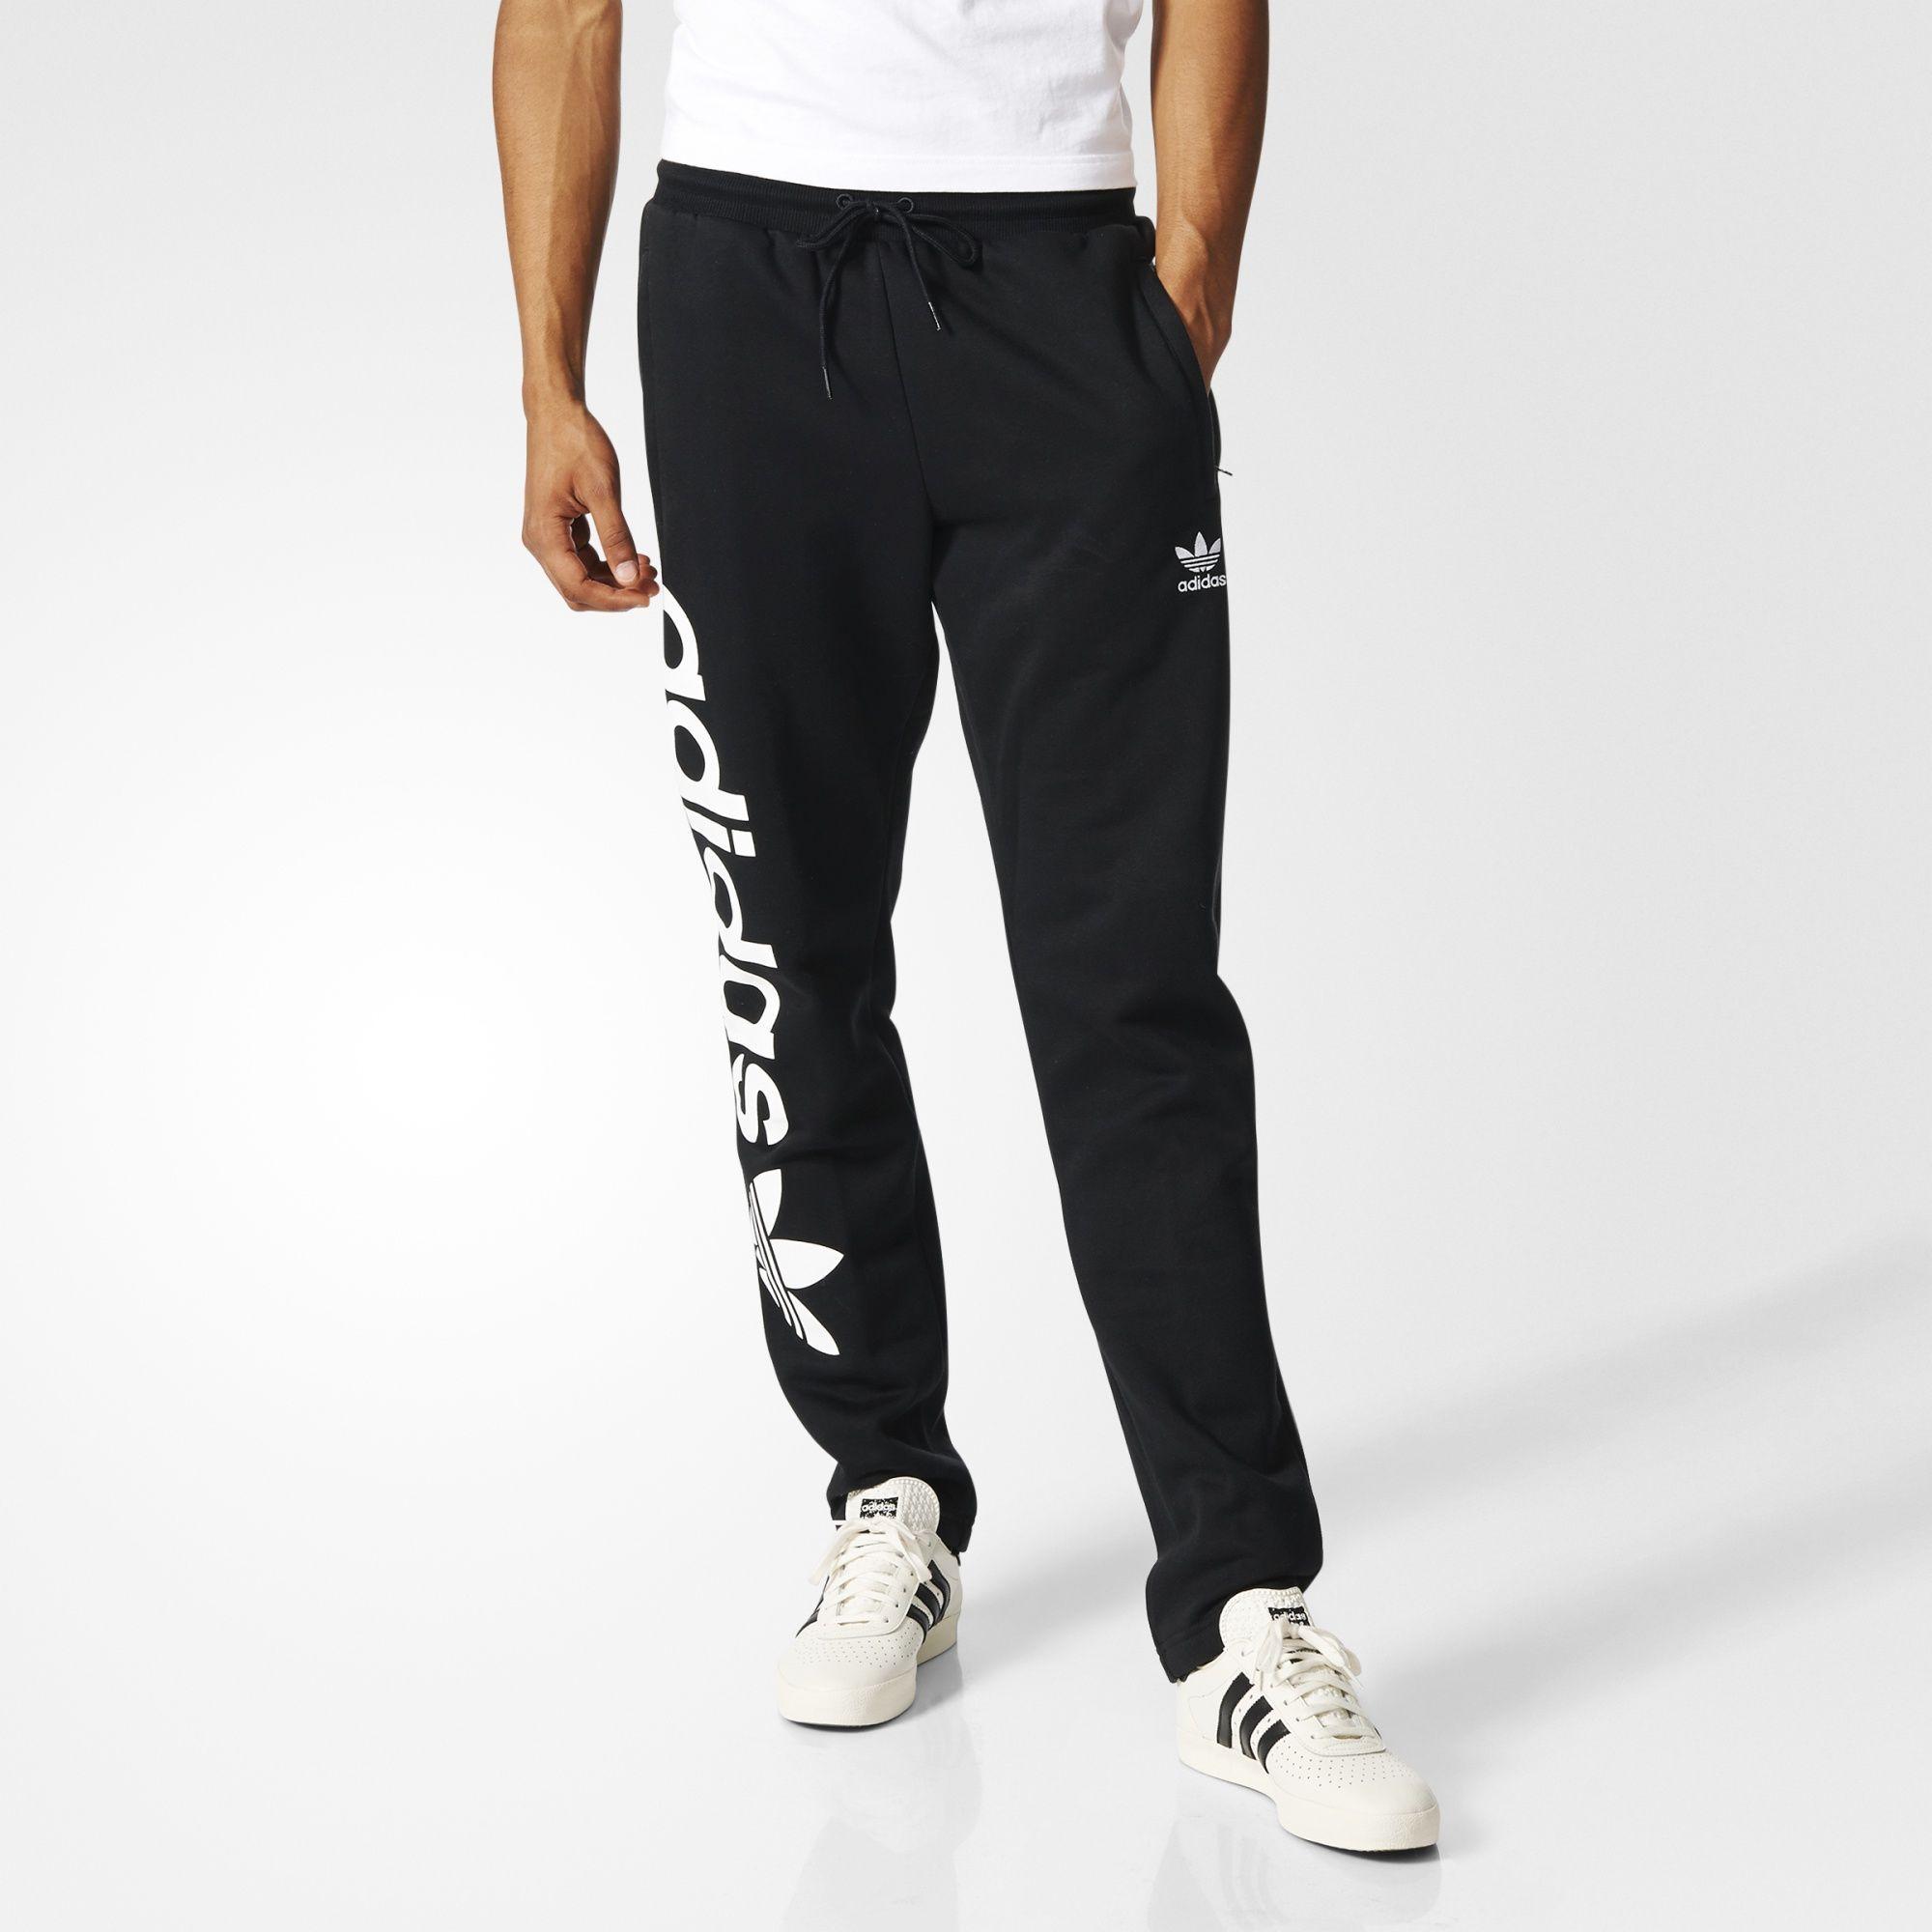 adidas - Men's Trefoil Track Pants